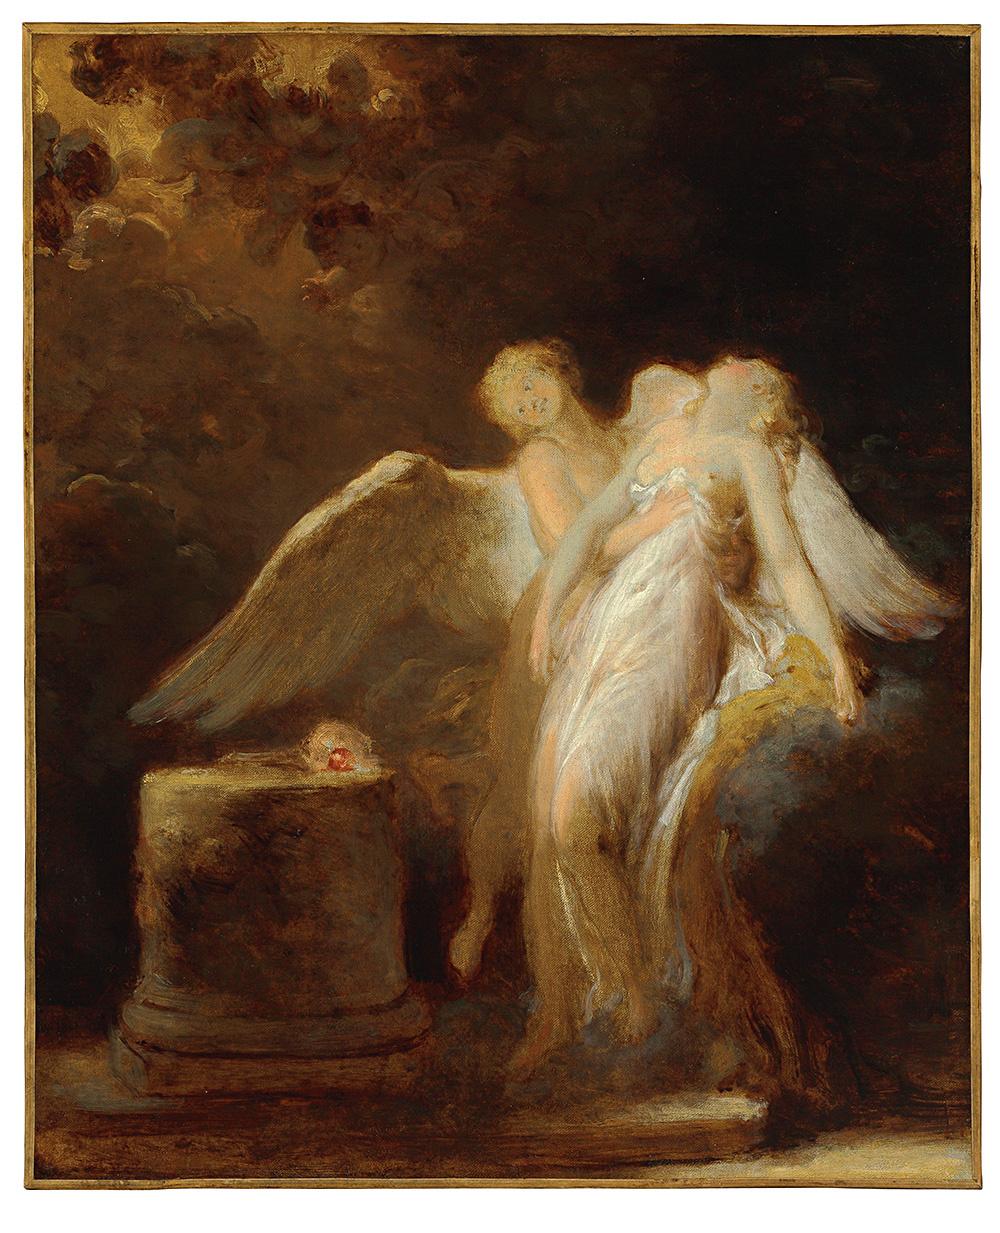 Jean-Honore Fragonard. Sacrifice Roses